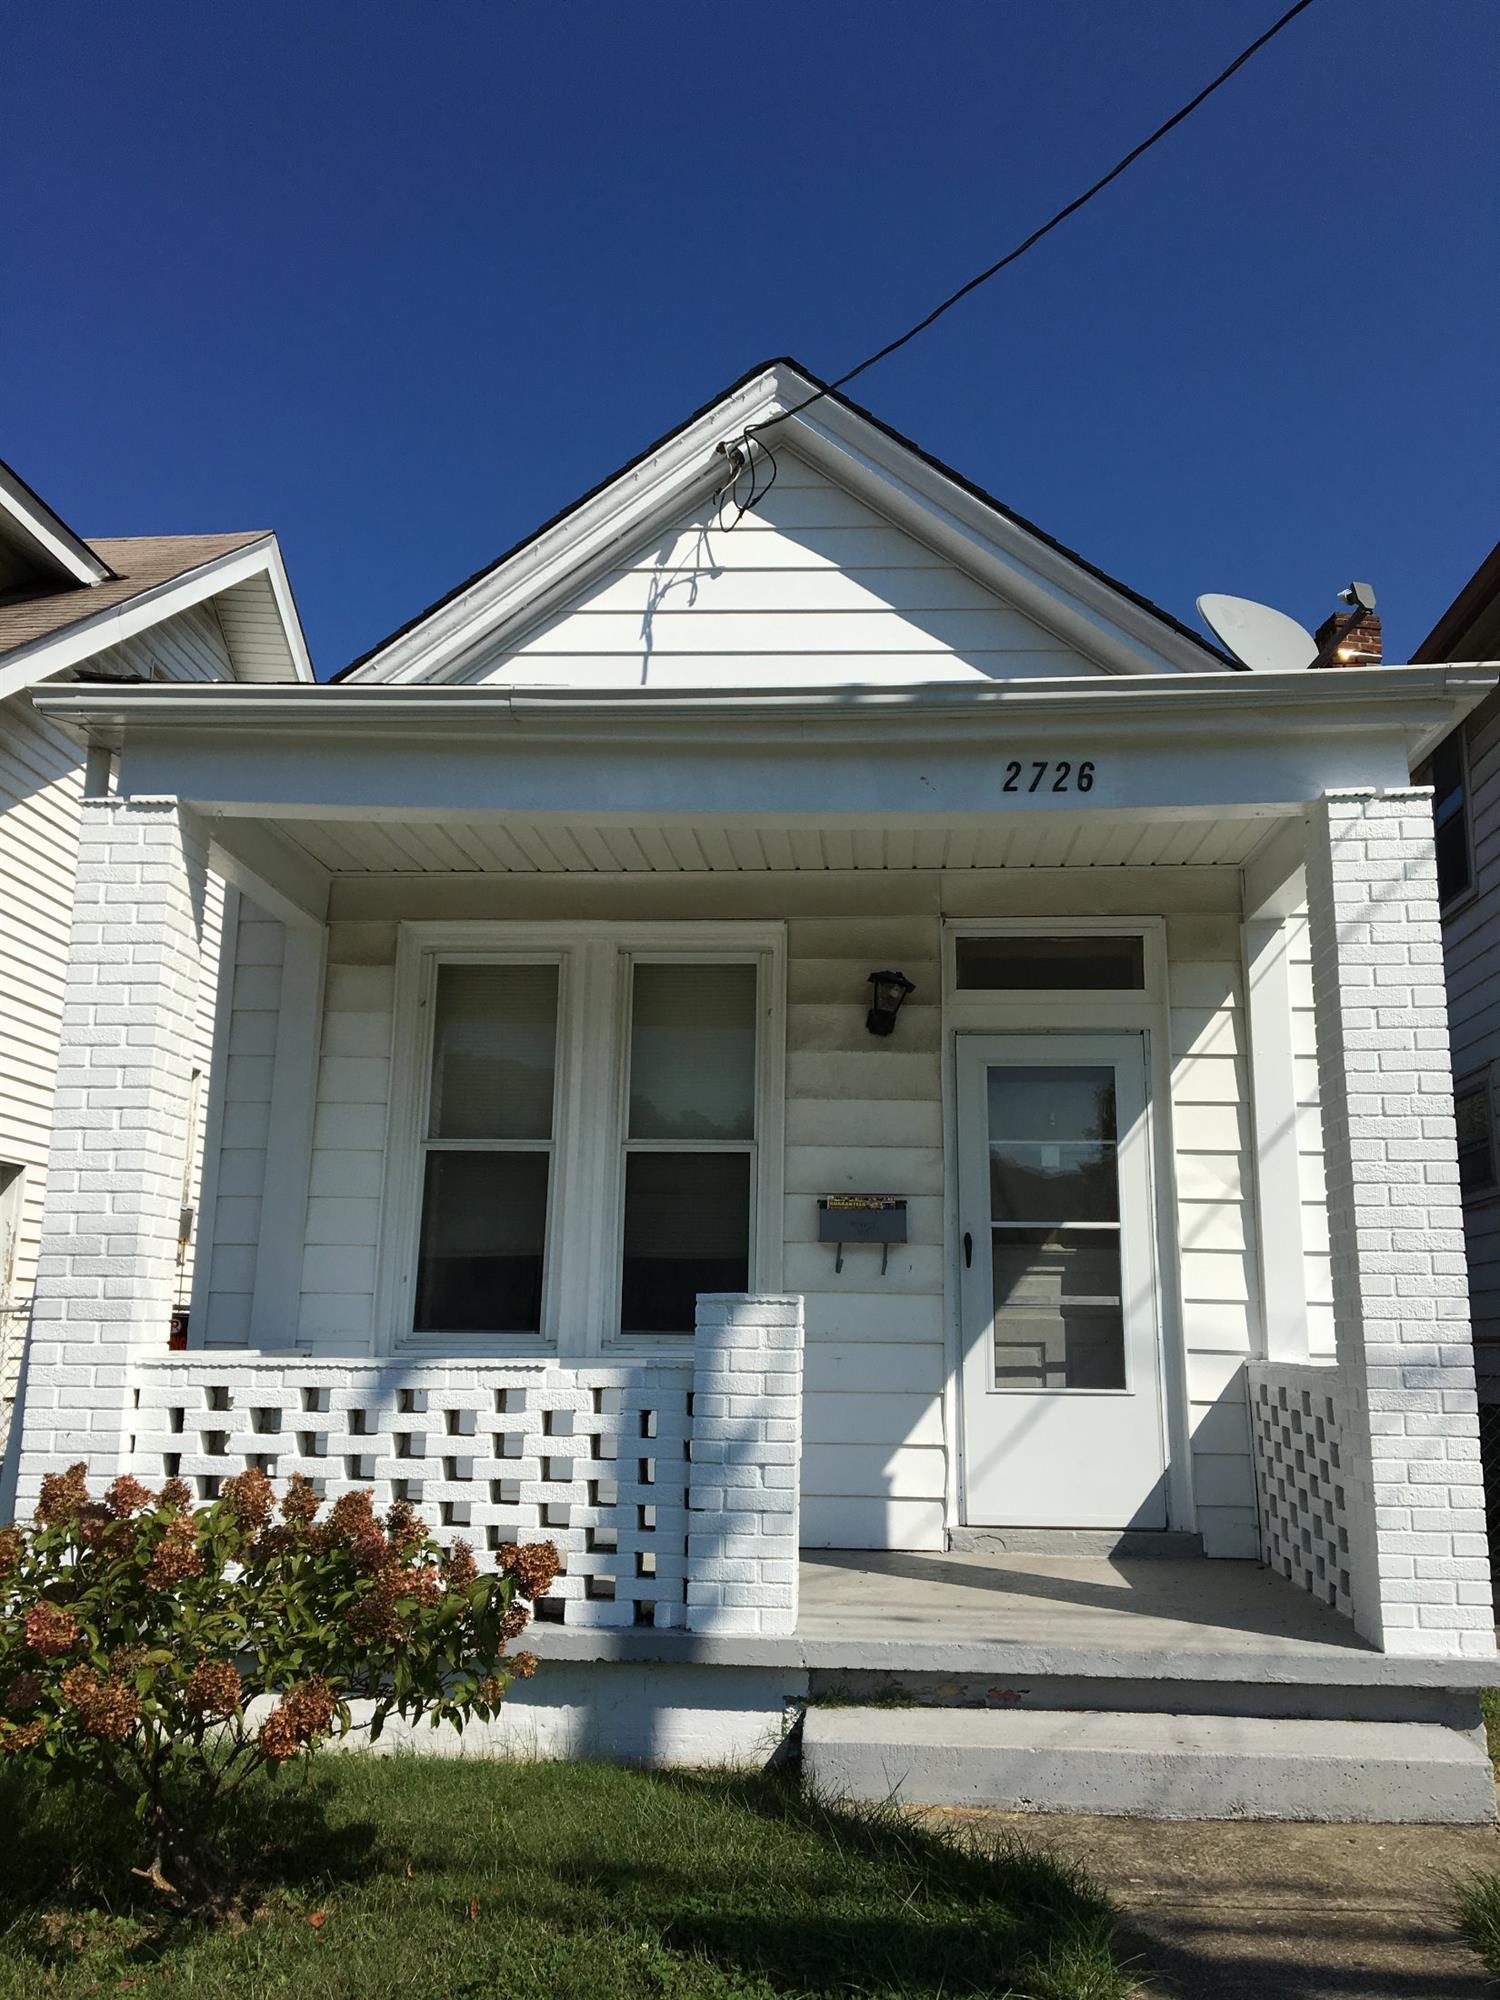 2726 Latonia Ave